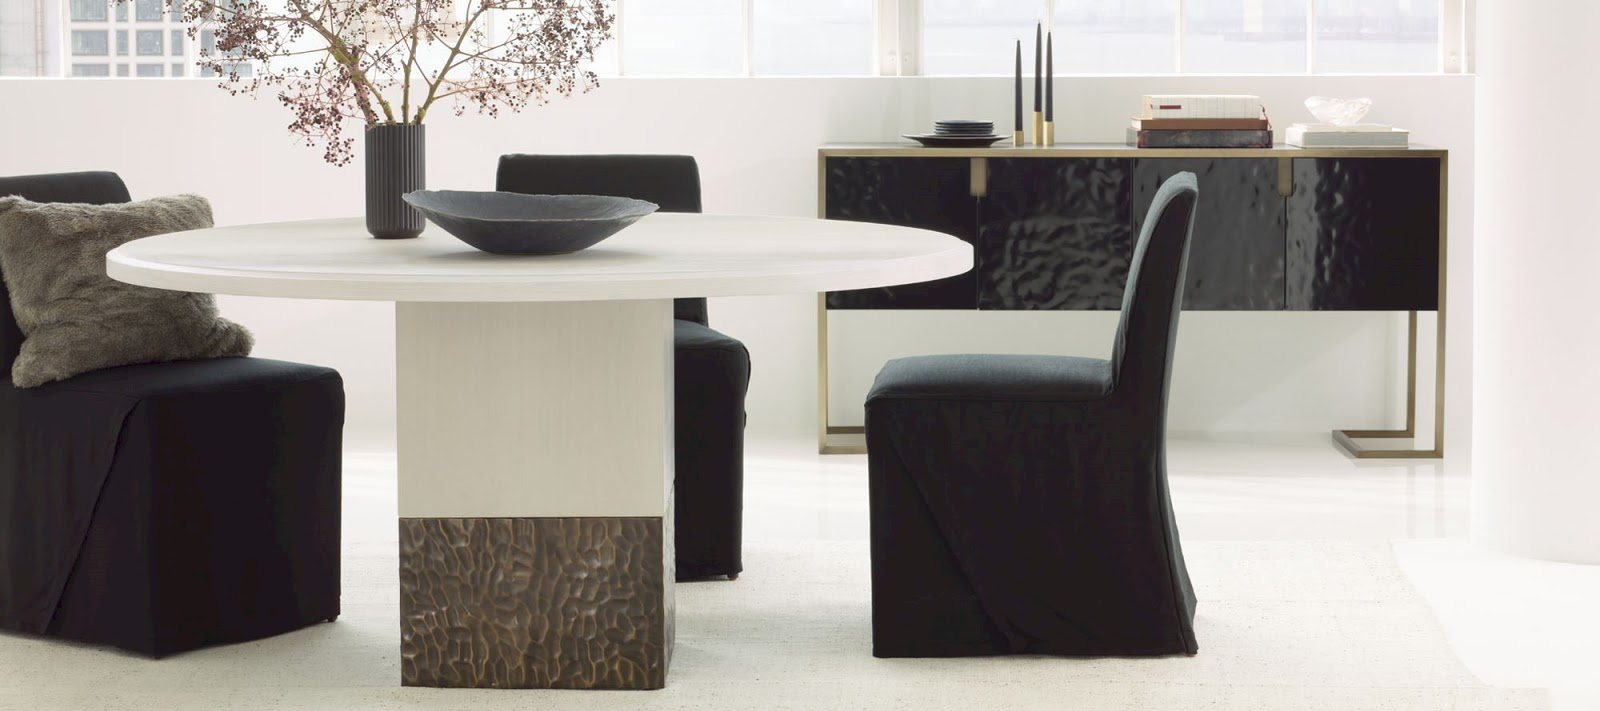 fiorito interior design: kara mann for baker